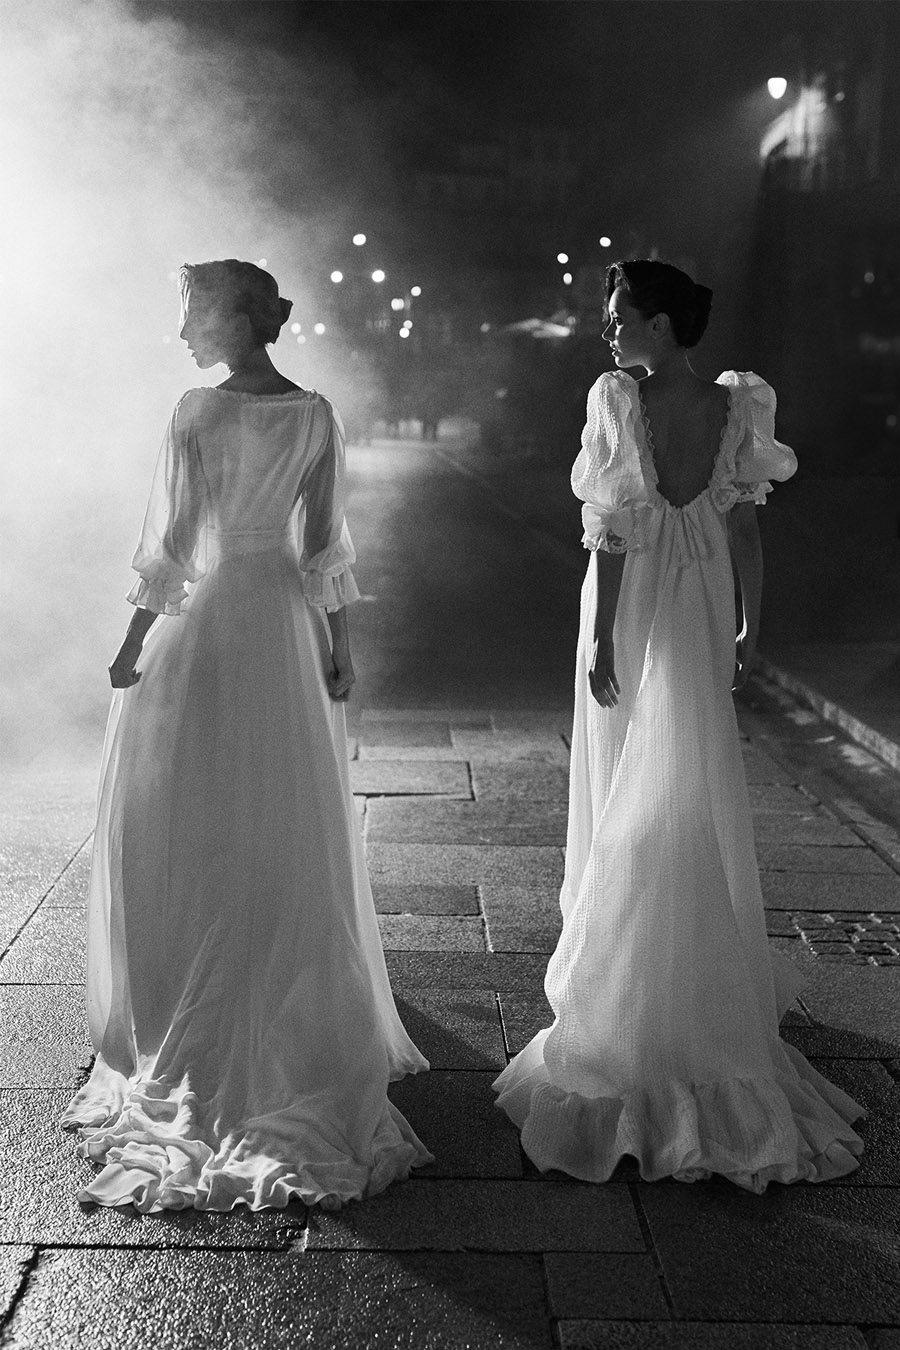 MAJESTIC, NUEVA COLECCIÓN NOVIA 2020 DE BOÜRET novias-bouret-majestic